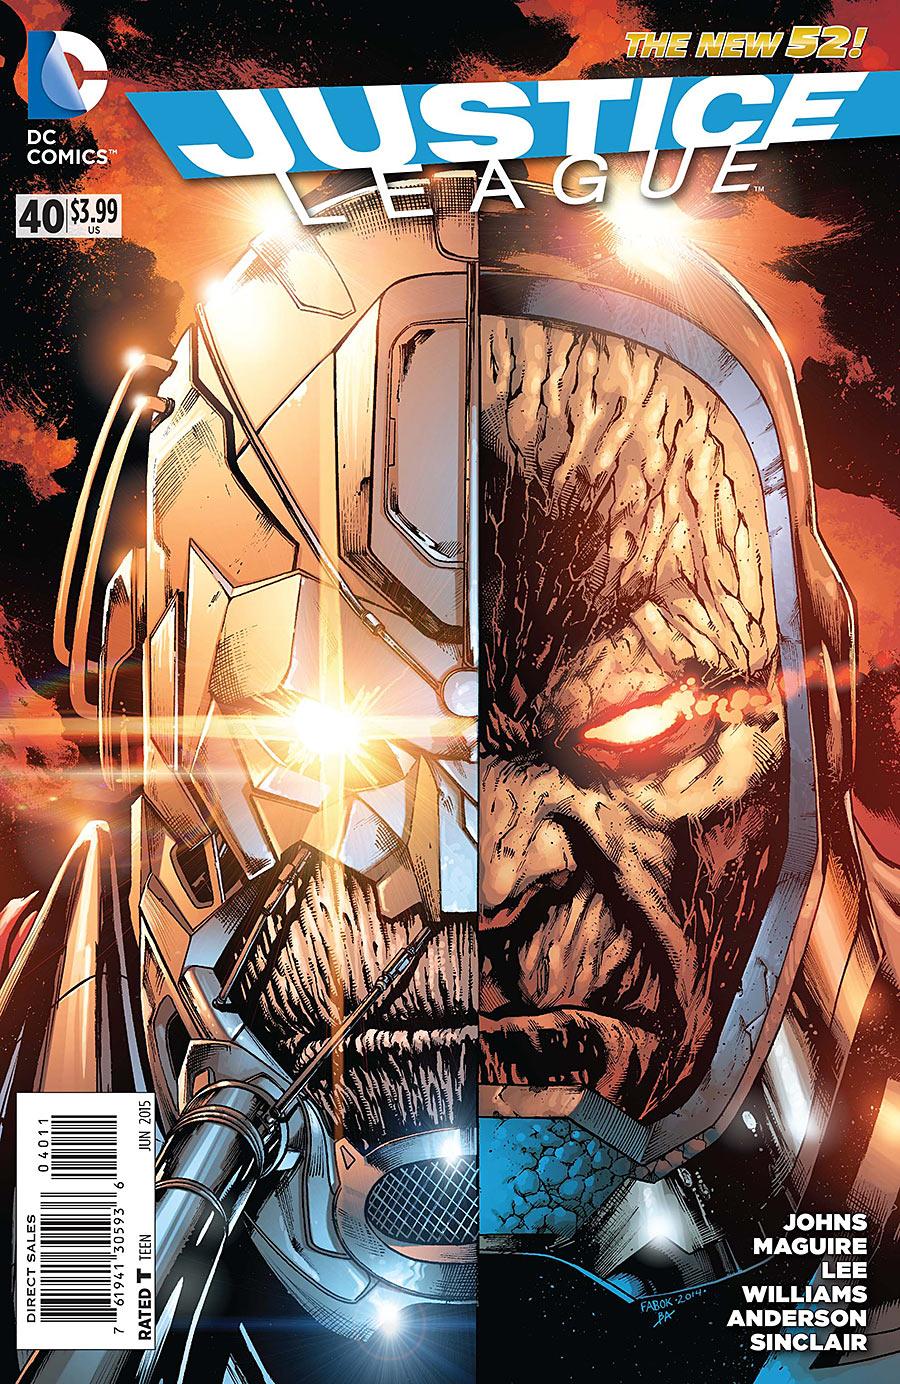 Liga da Justiça: A Guerra de Darkseid